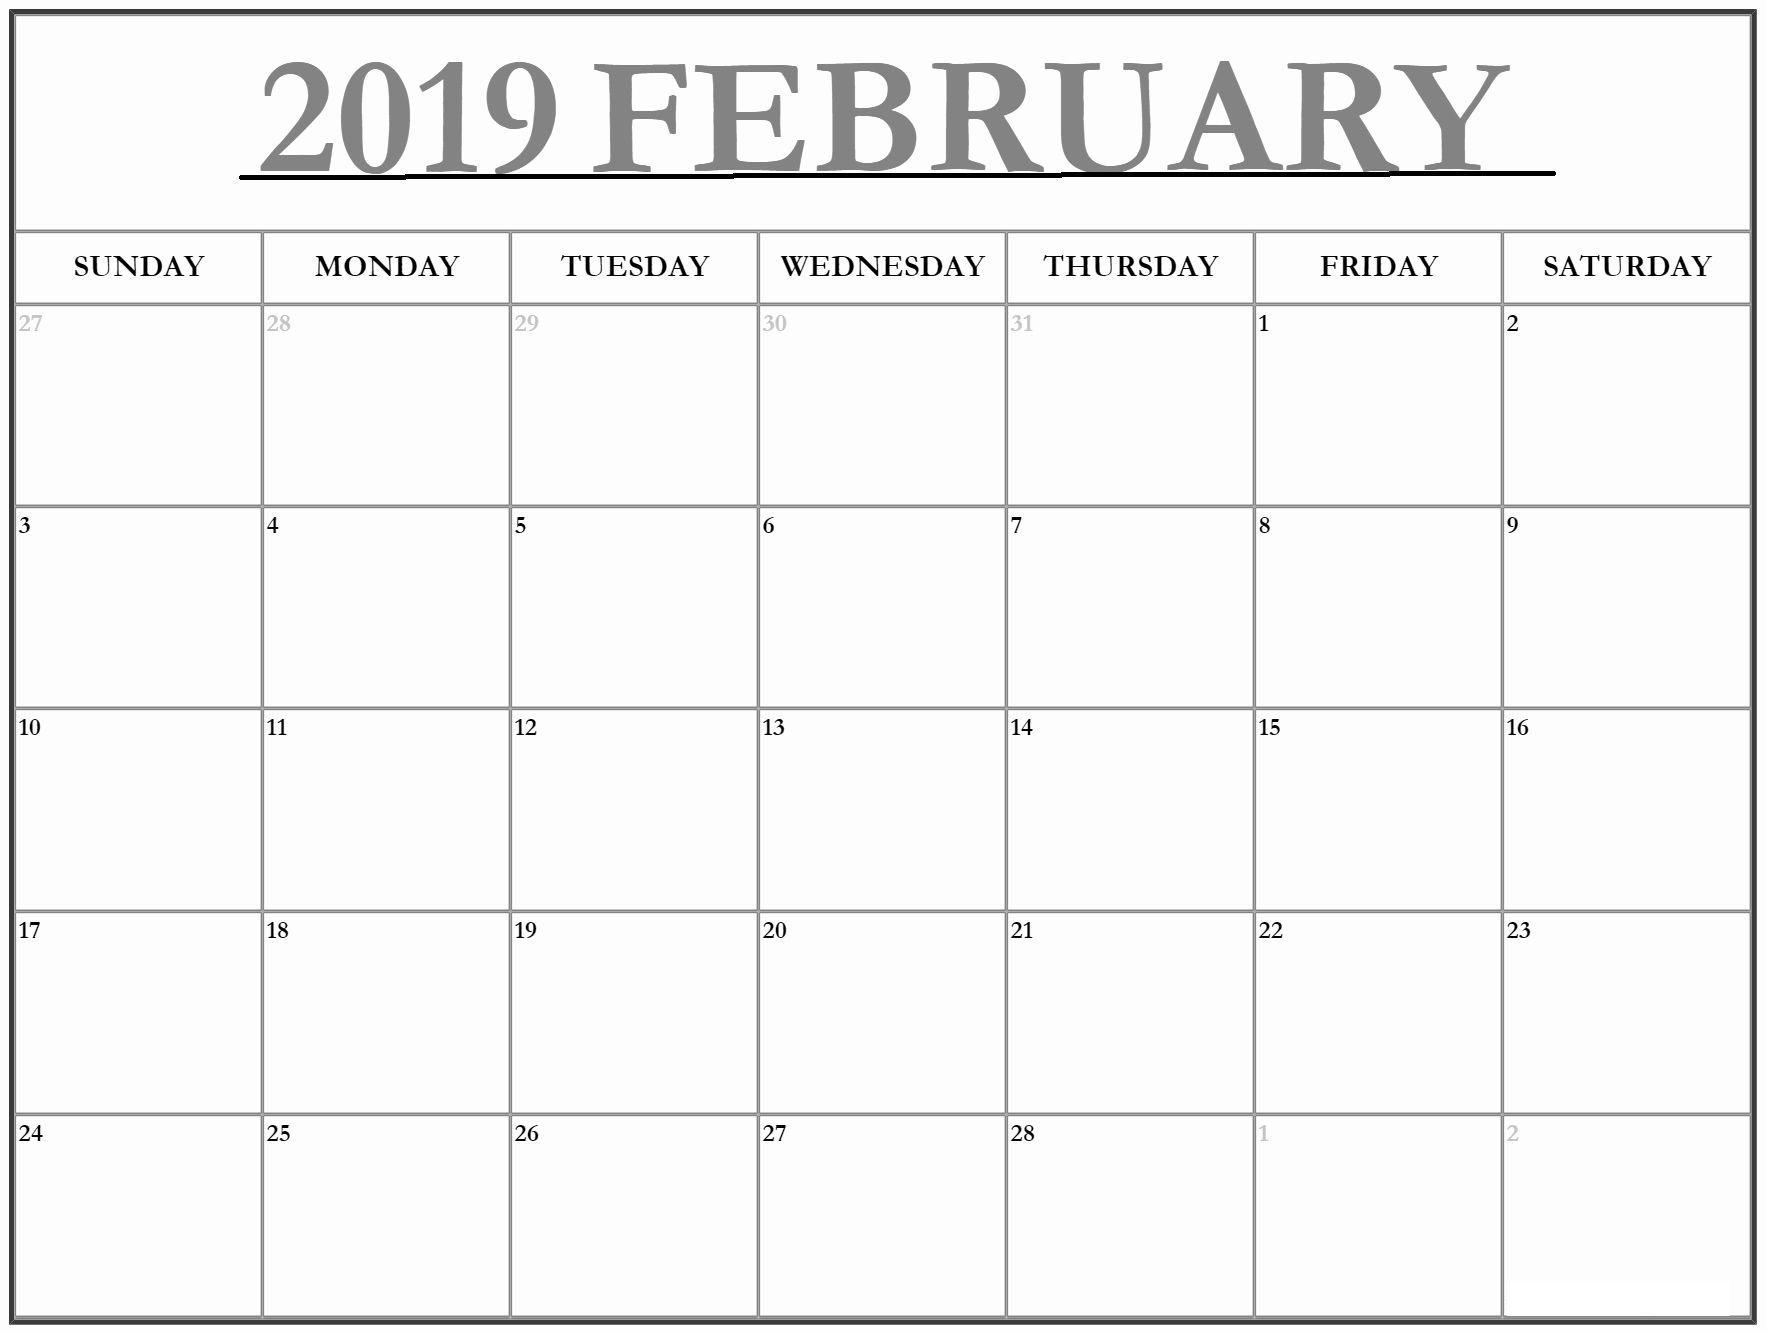 Large Print Calendar Template 2019 | Free Printable Calendar